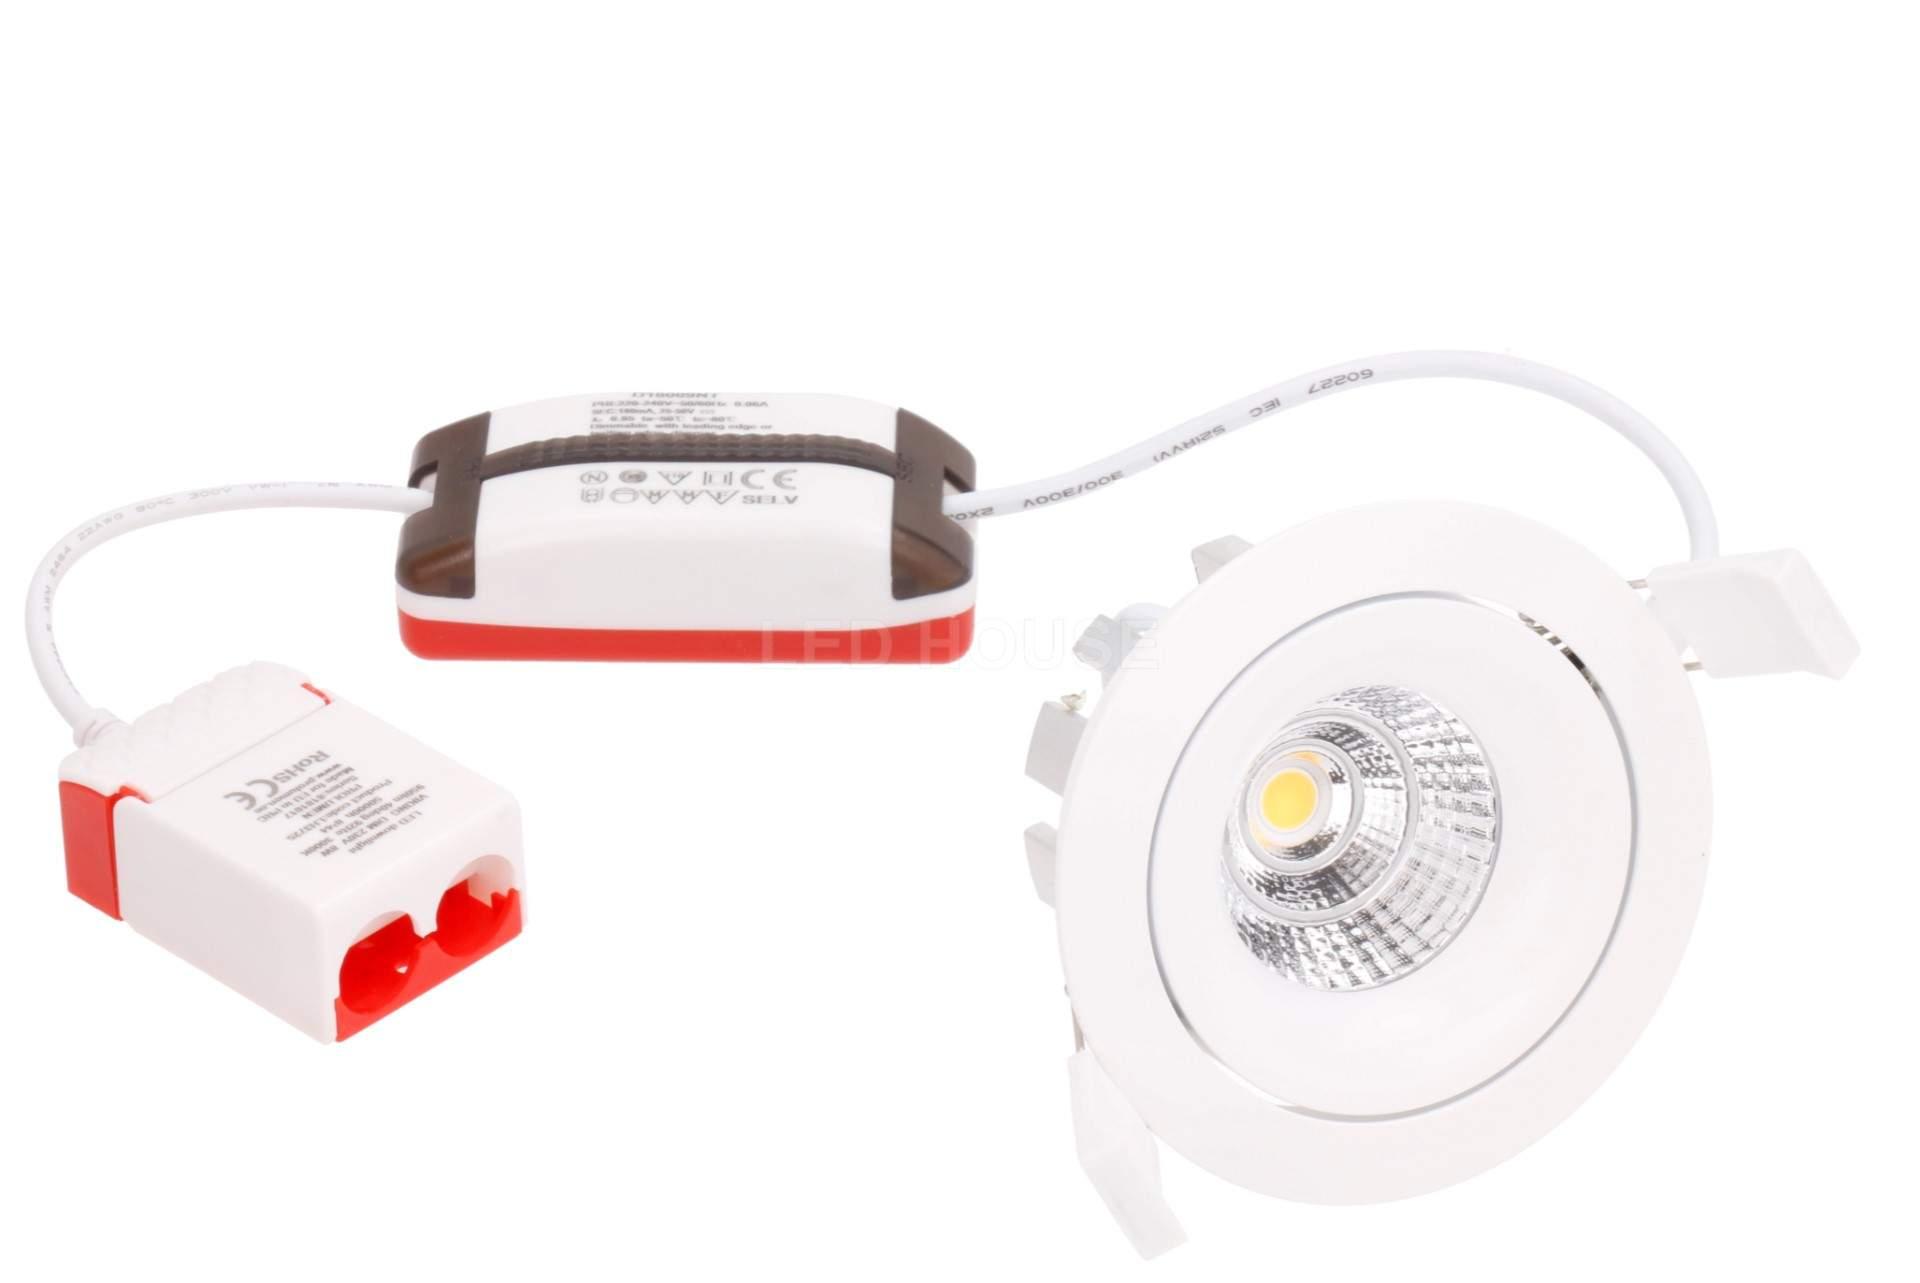 LED downlight LED downlight PROLUMEN VIKING DIM white round 8W 950lm CRI92  40° IP44 3000K warm white